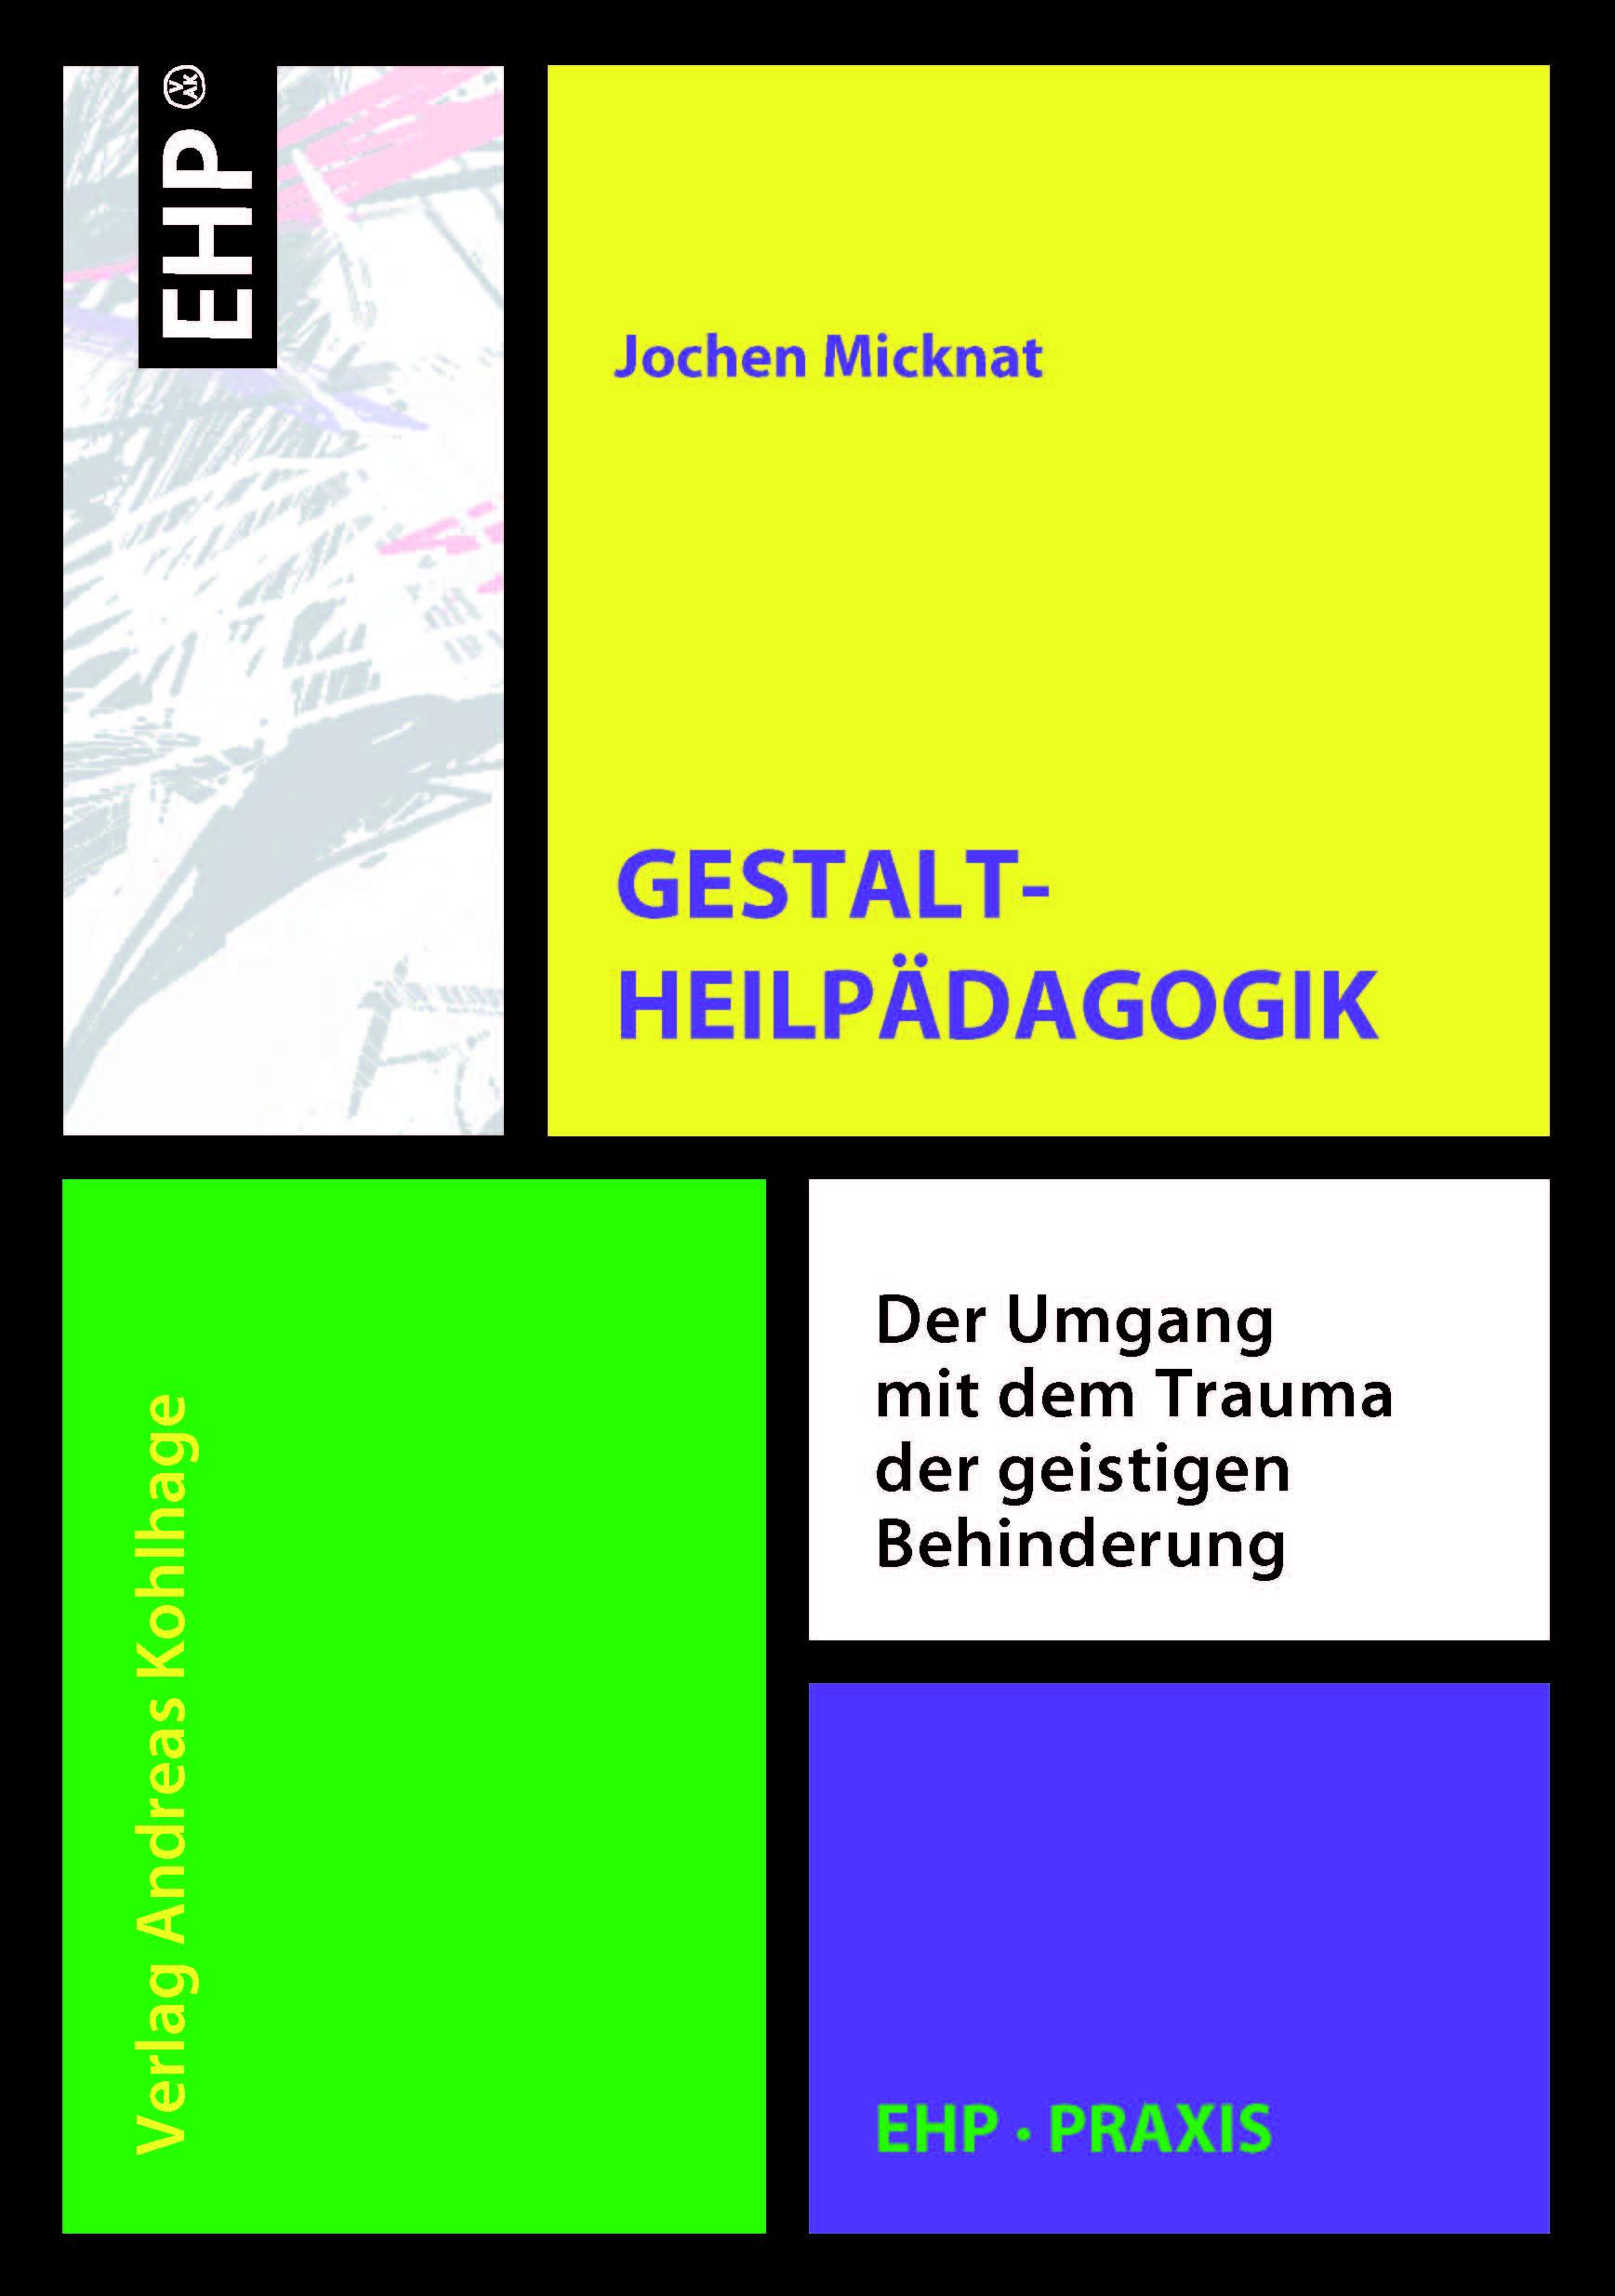 Gestaltheilpaedagogik-Jochen-Micknat-9783897970205